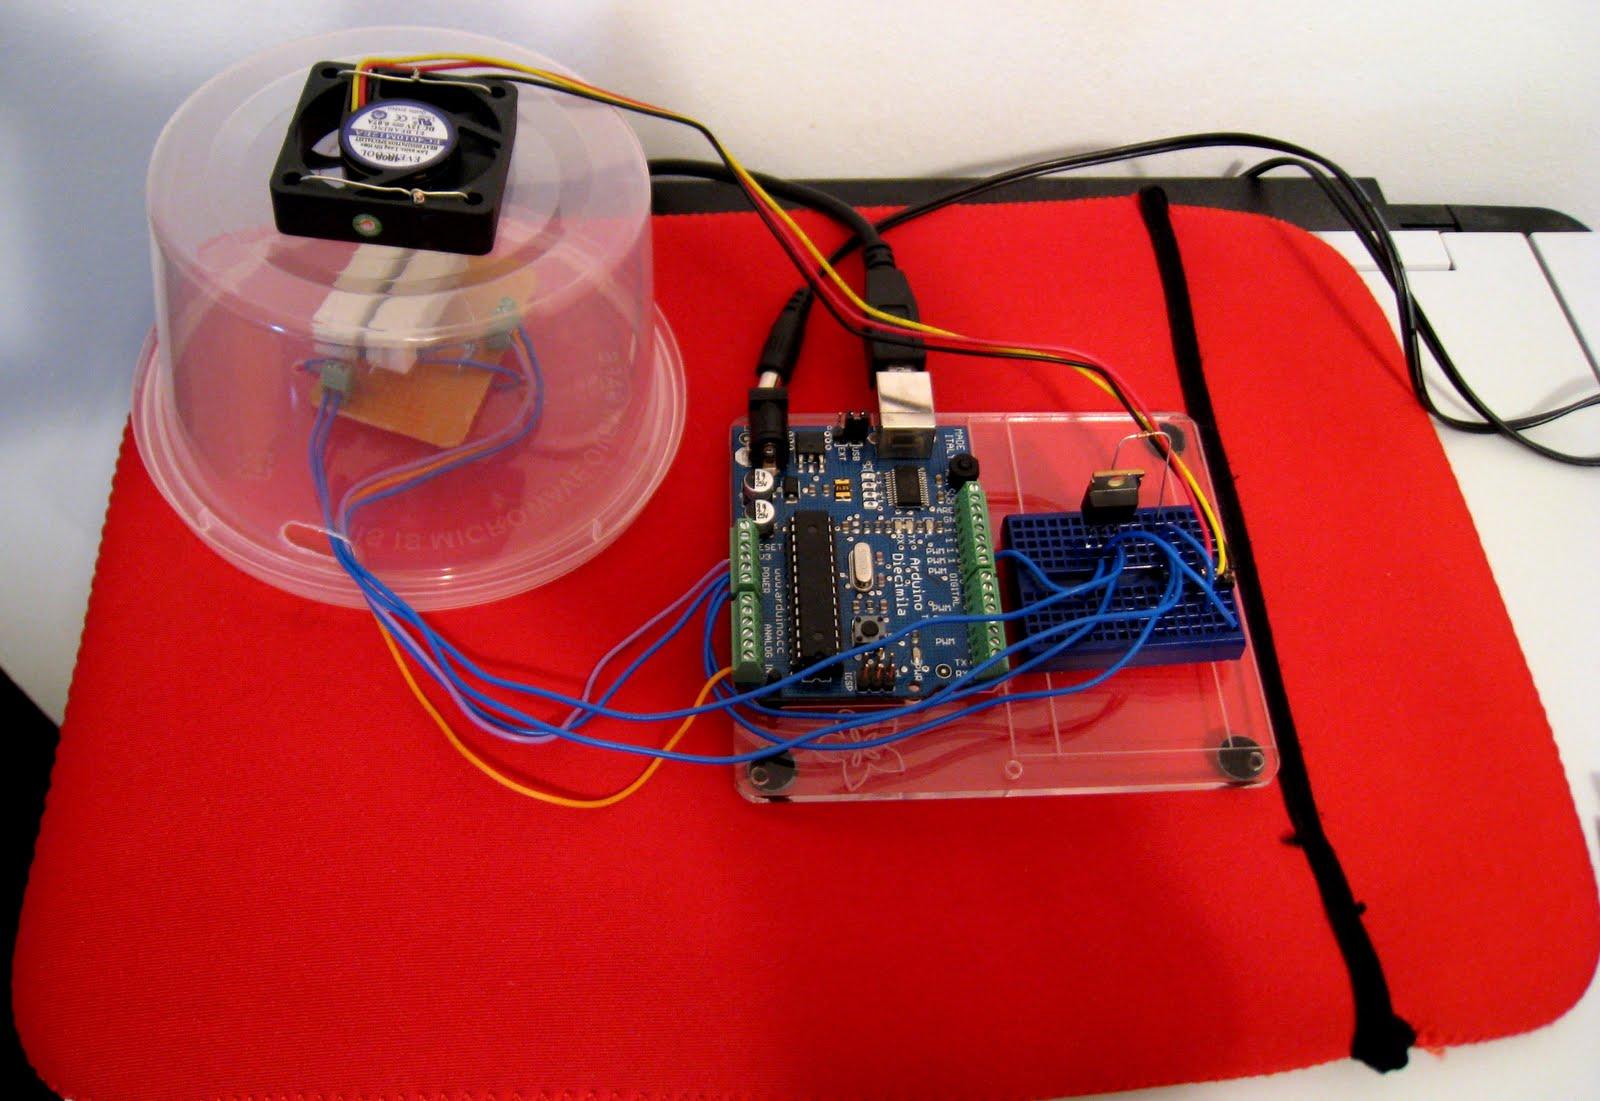 Tinkering With Electronics Maqueta De Control Pid Con Arduino